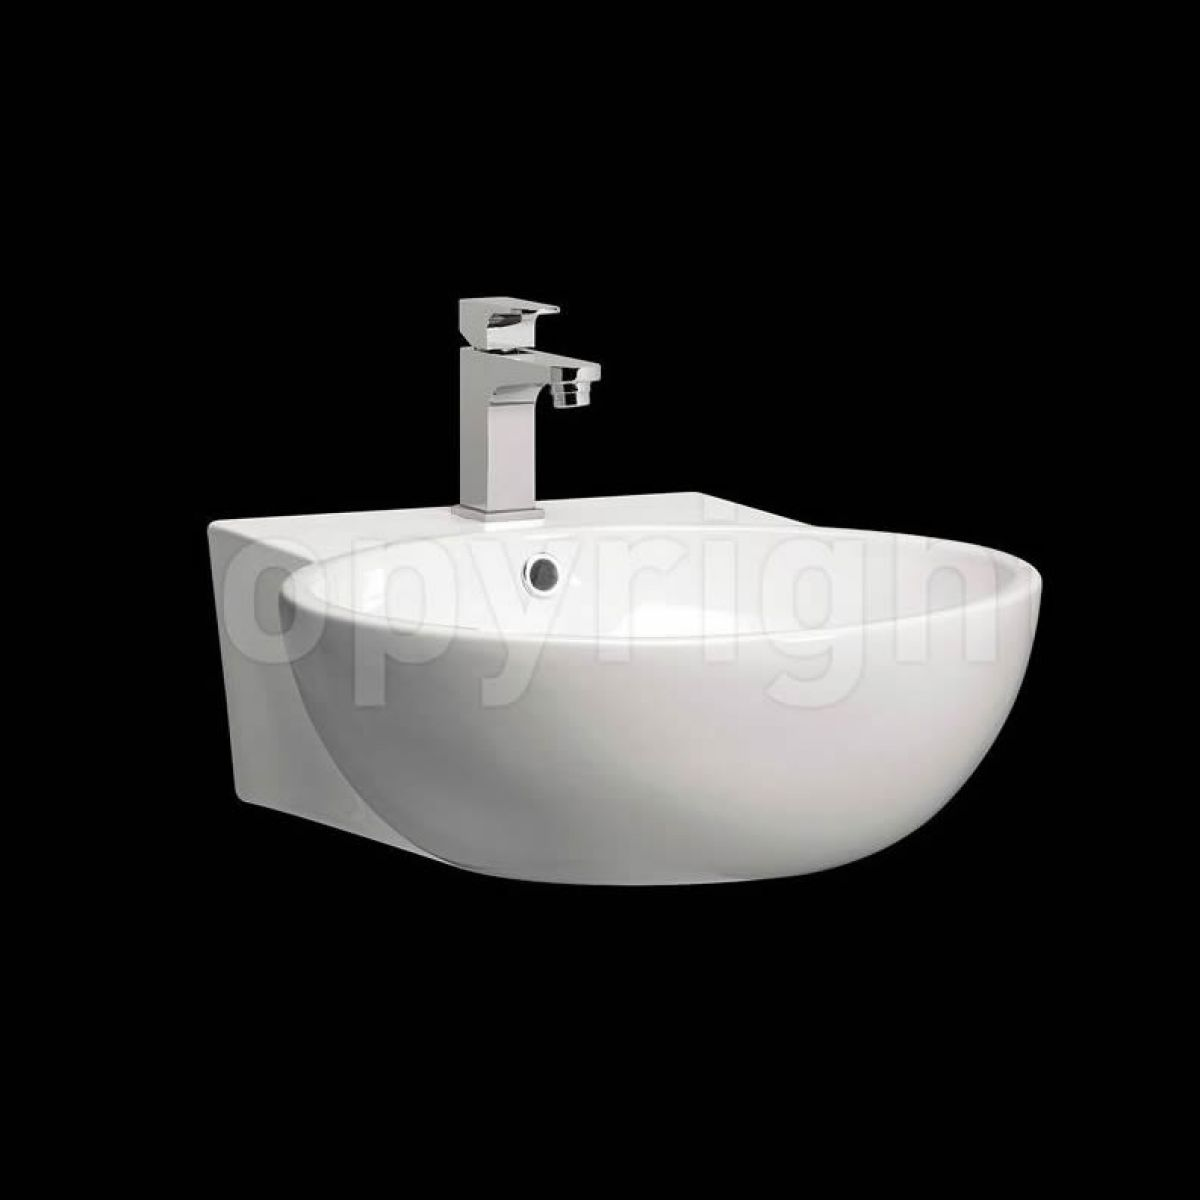 Wall Hung Bathroom Basins : modest 50 wall mounted basin bauh186 m0002scw home bathrooms basins ...